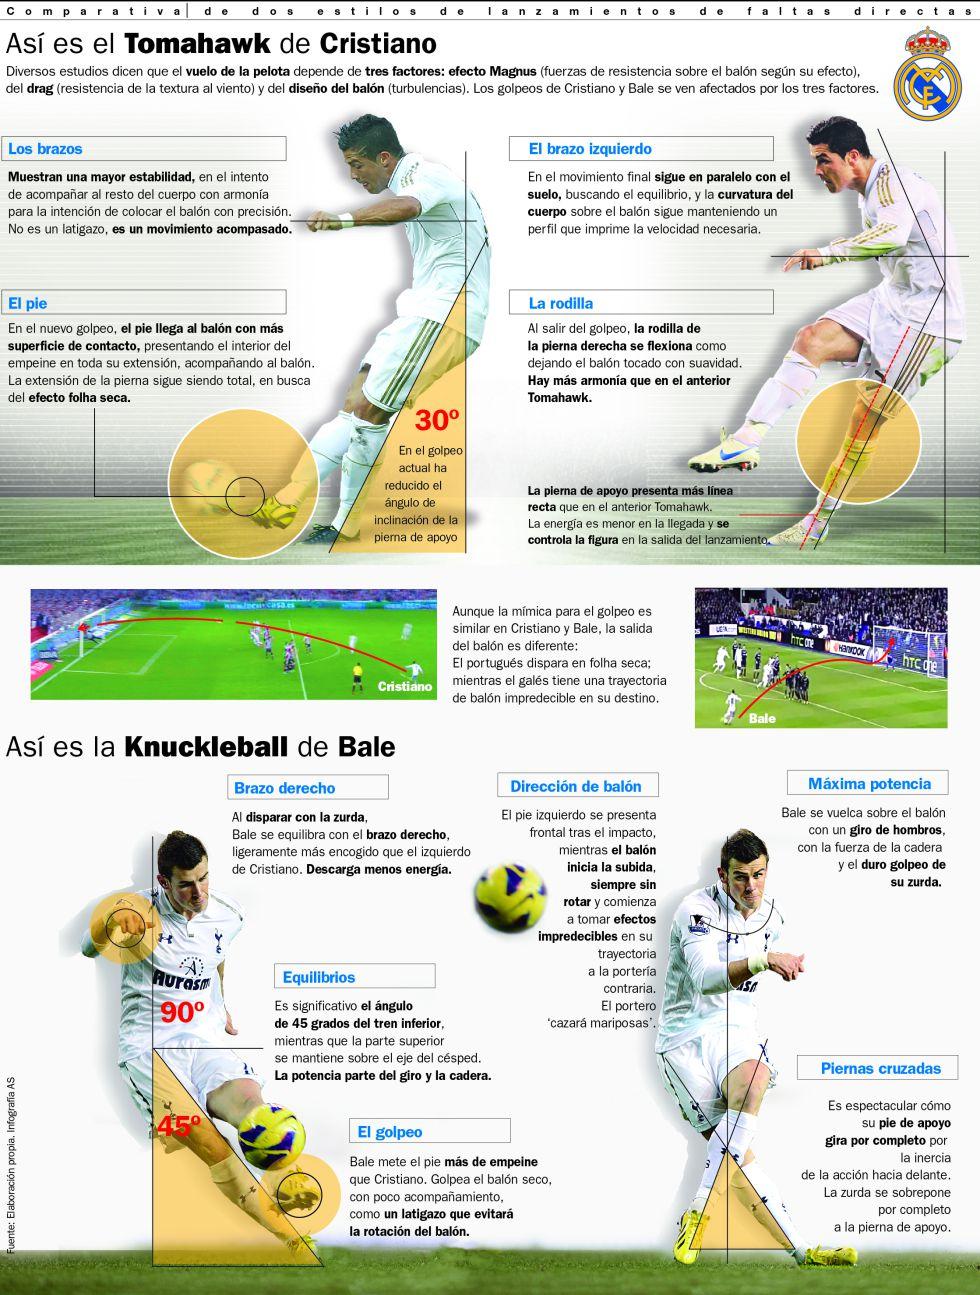 http://futbol.as.com/futbol/imagenes/2013/09/14/mas_futbol/1379110685_492030_1379113105_noticia_grande.jpg